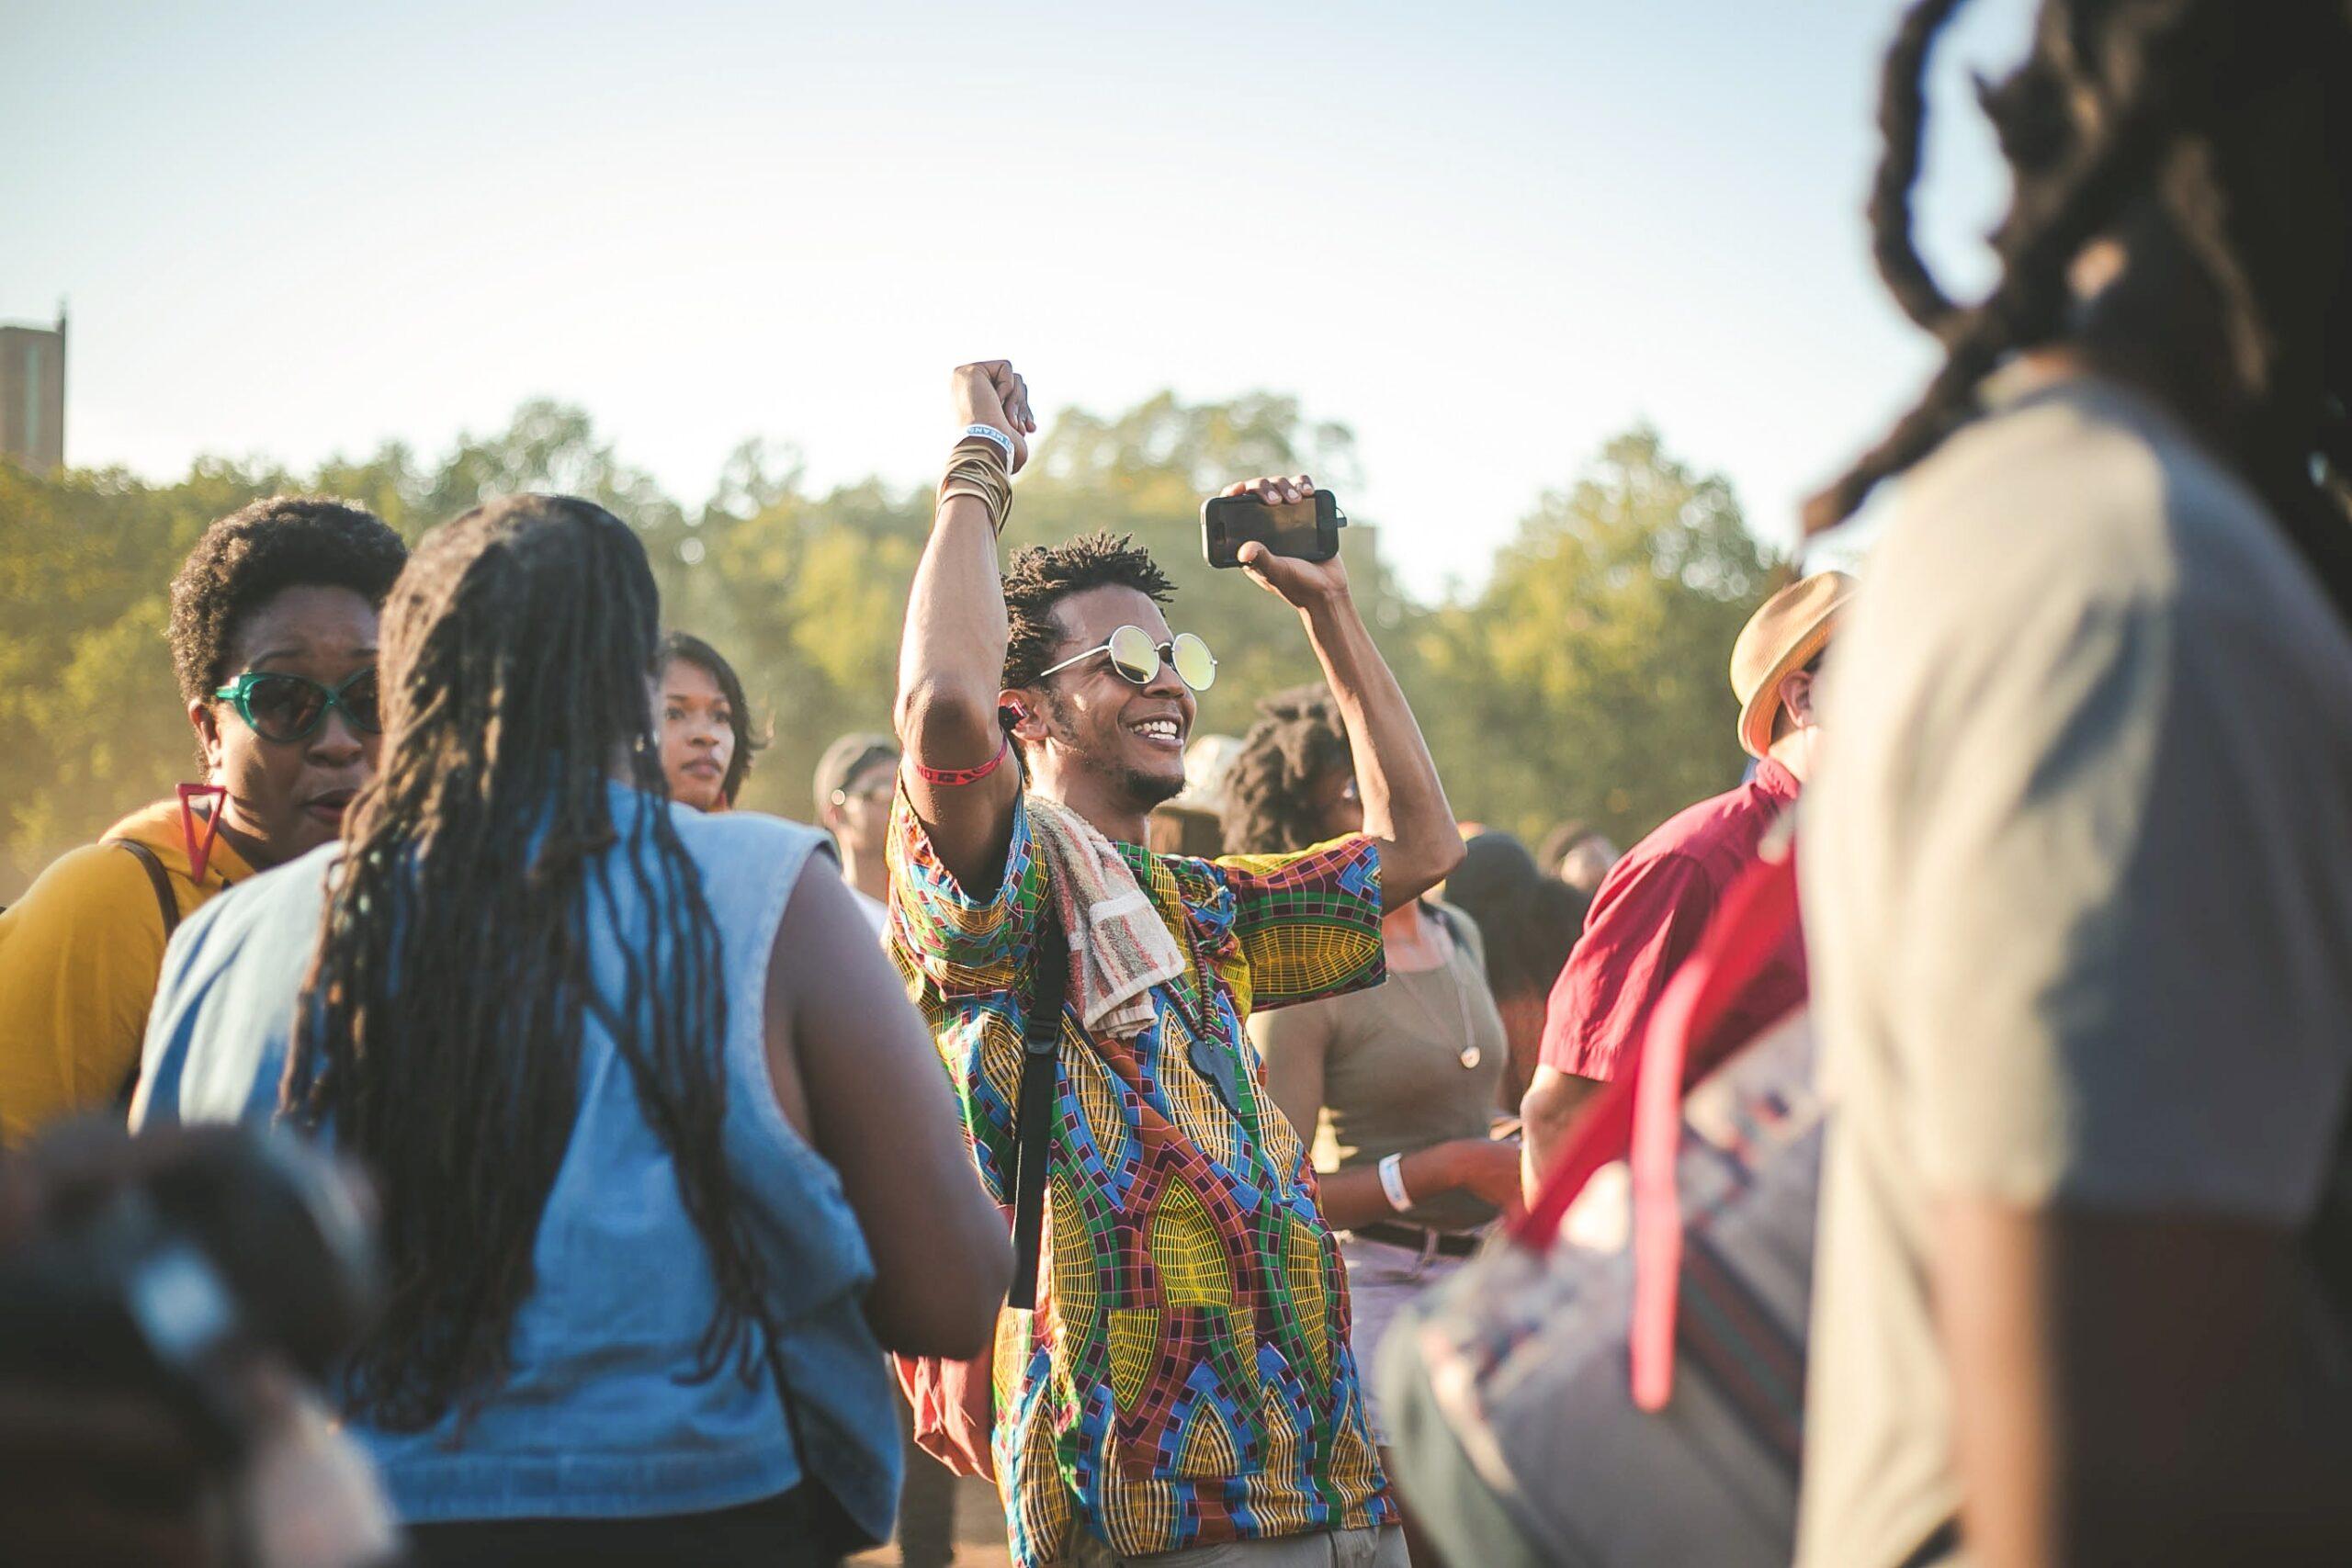 Man dancing in festival crowd